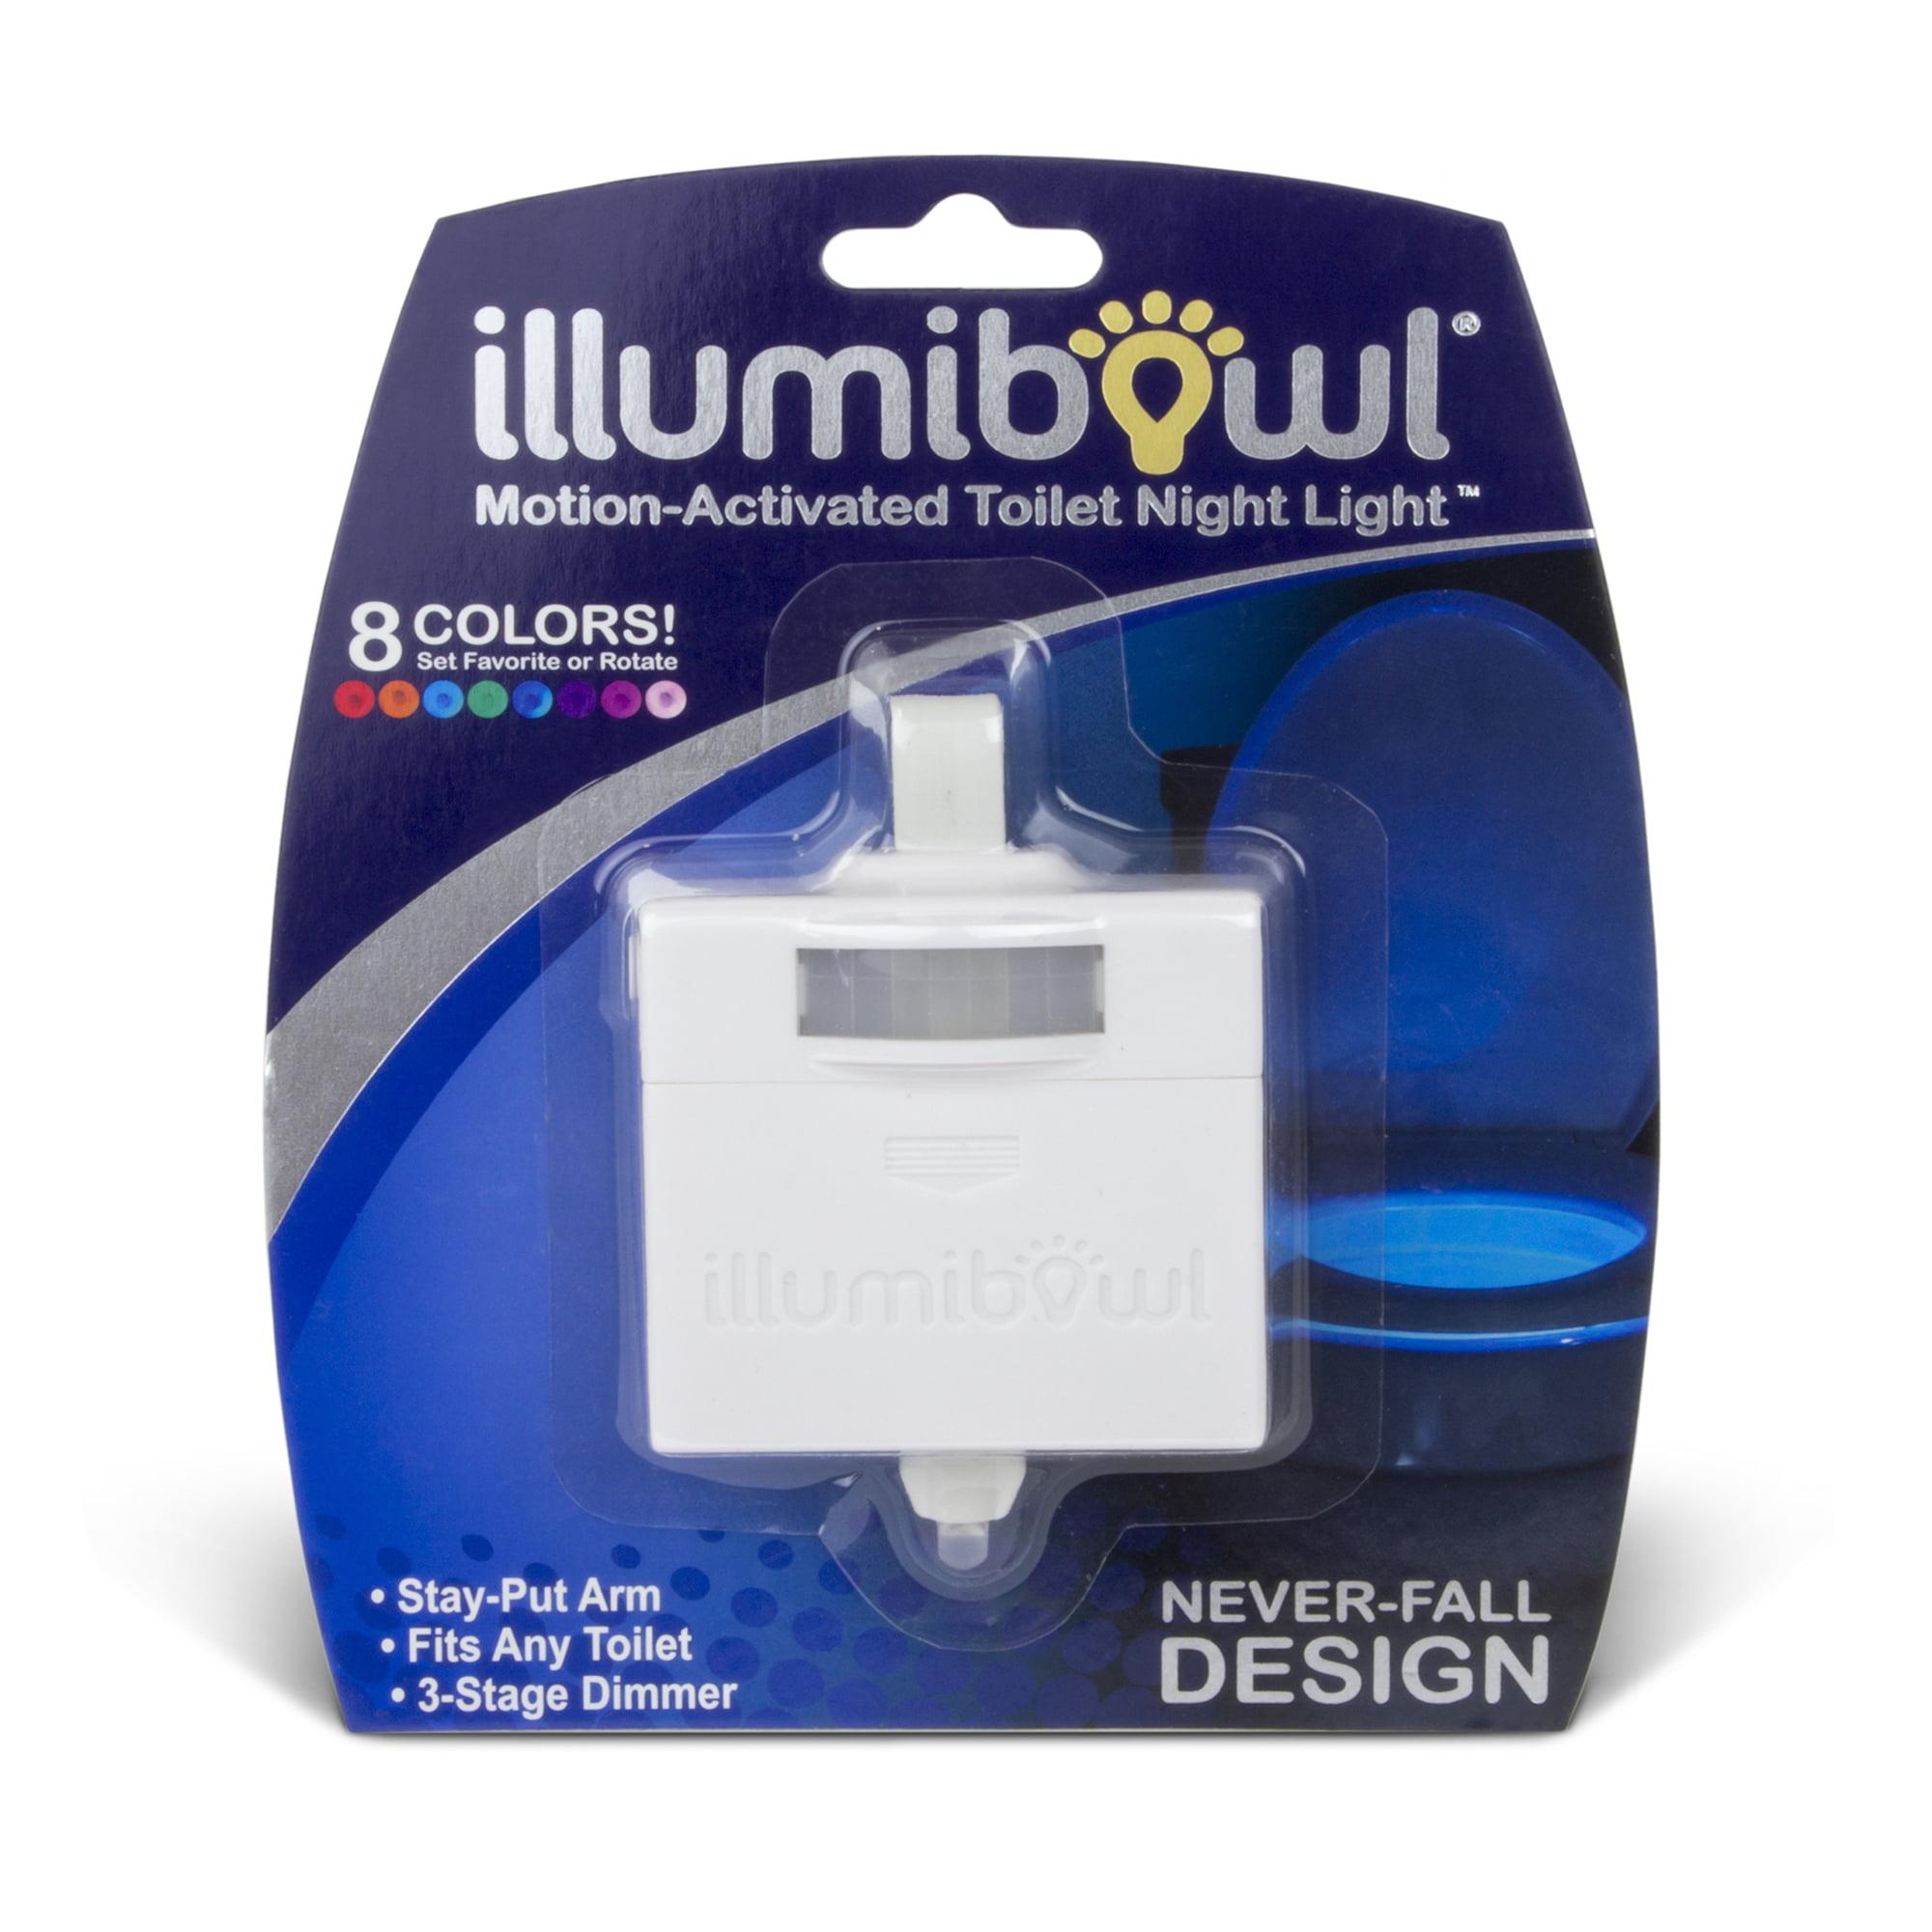 Illumibowl Motion-Activated Bathroom Light, Multi-Color LED